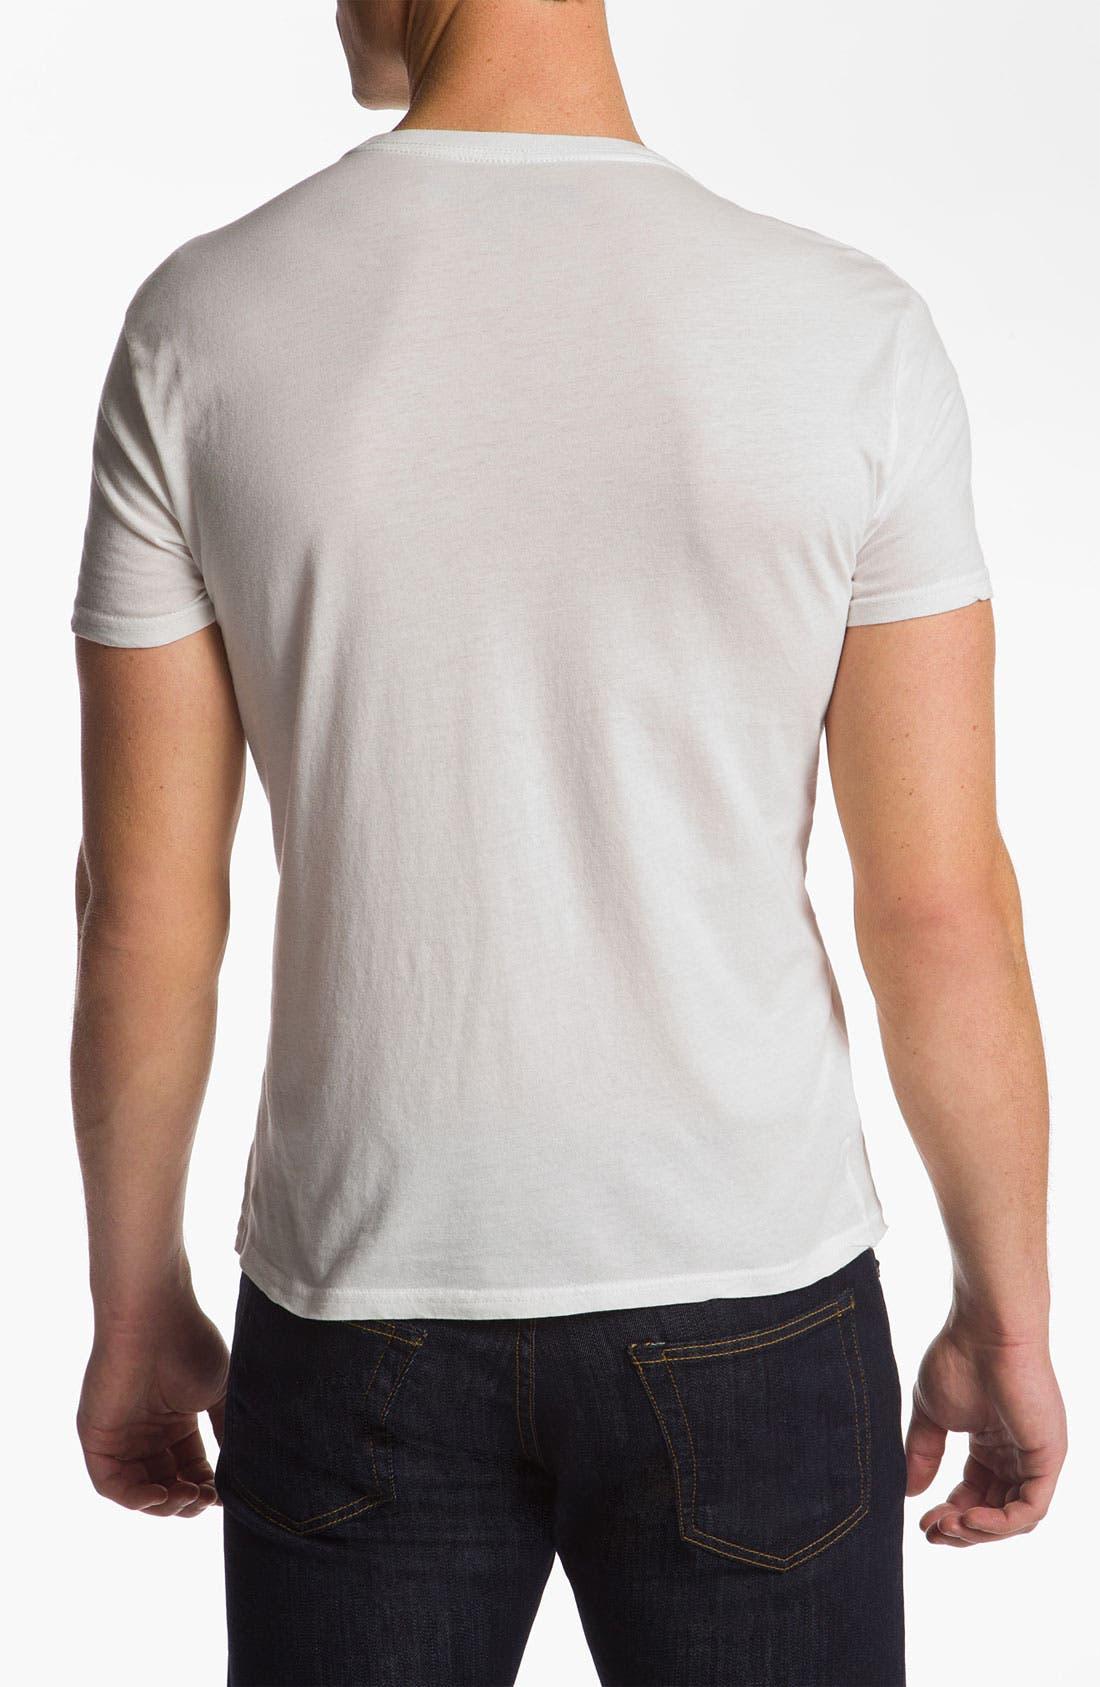 Alternate Image 2  - The Original Retro Brand 'University of San Diego' T-Shirt